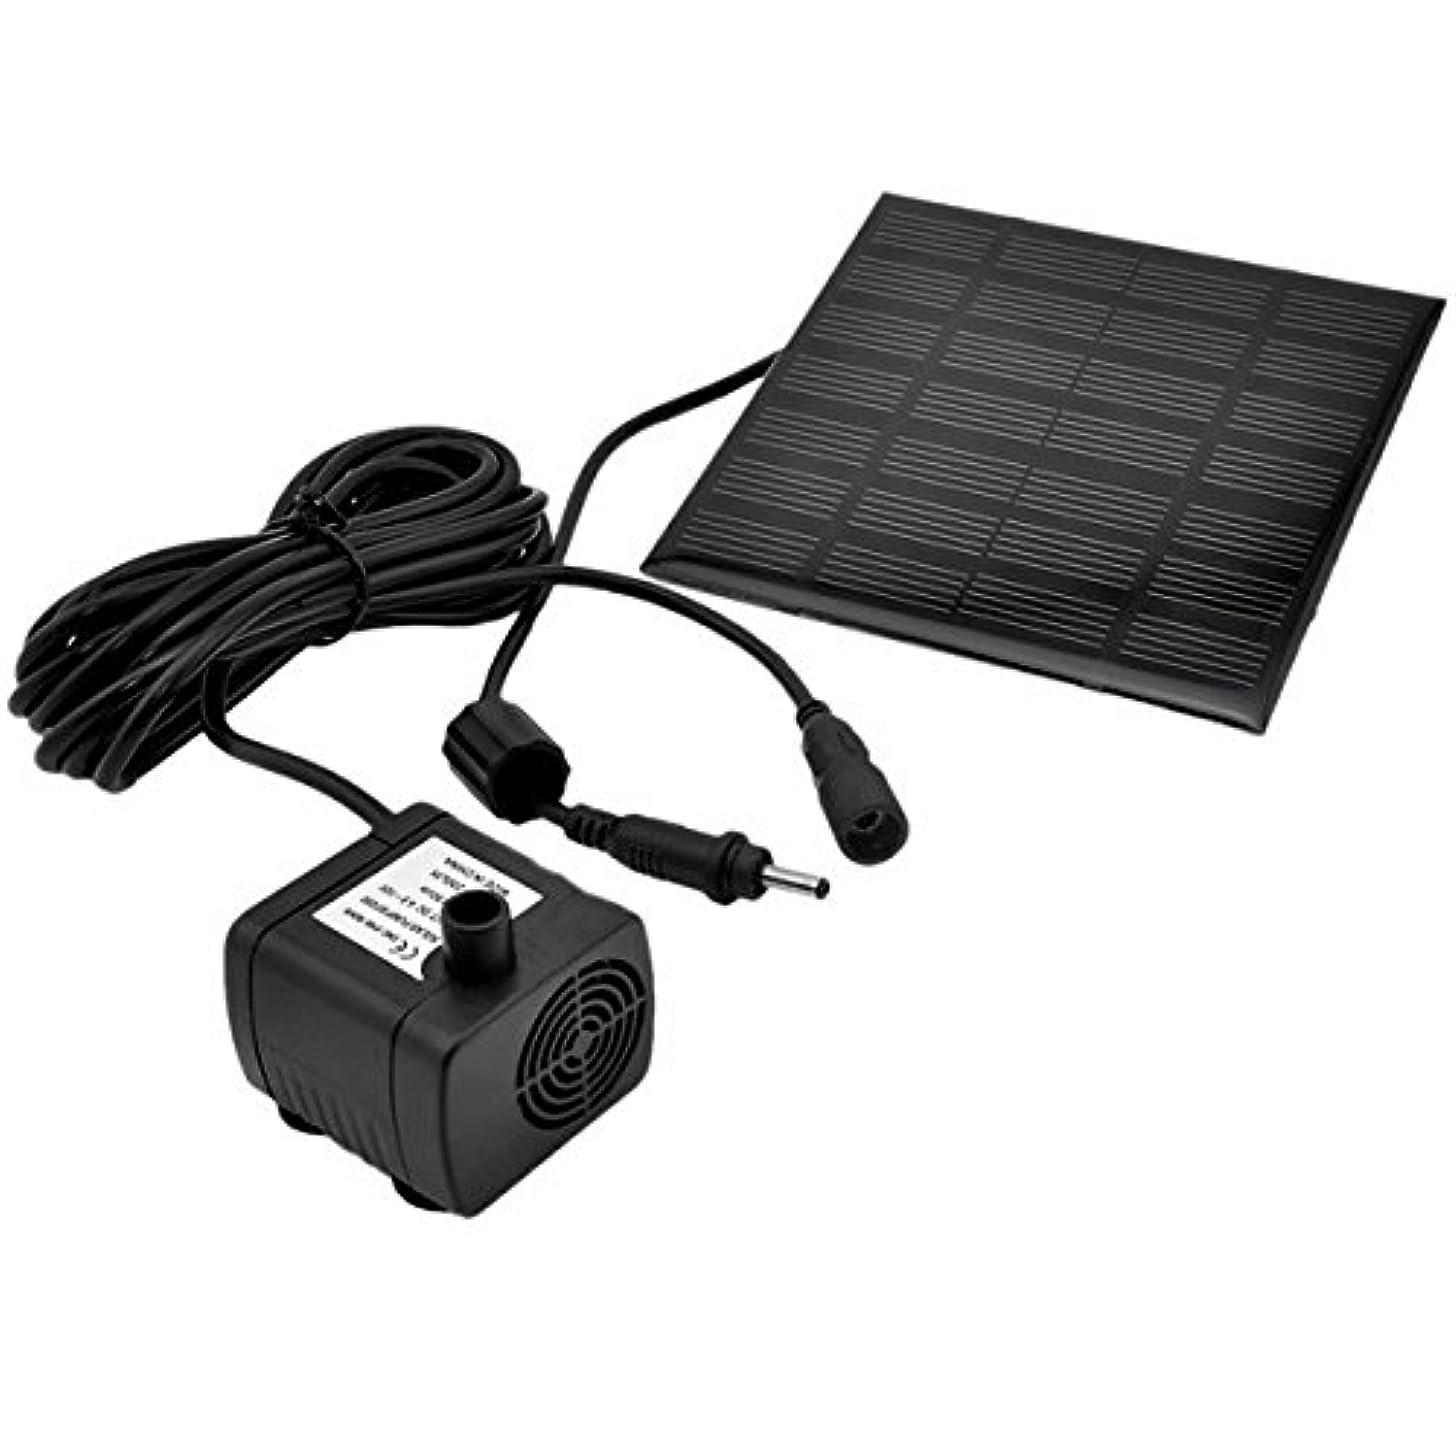 UEETEK 1.2W 7V 180L/H Solar Power Water Pump Garden Fountain Submersible Pump with Suckers (Black)